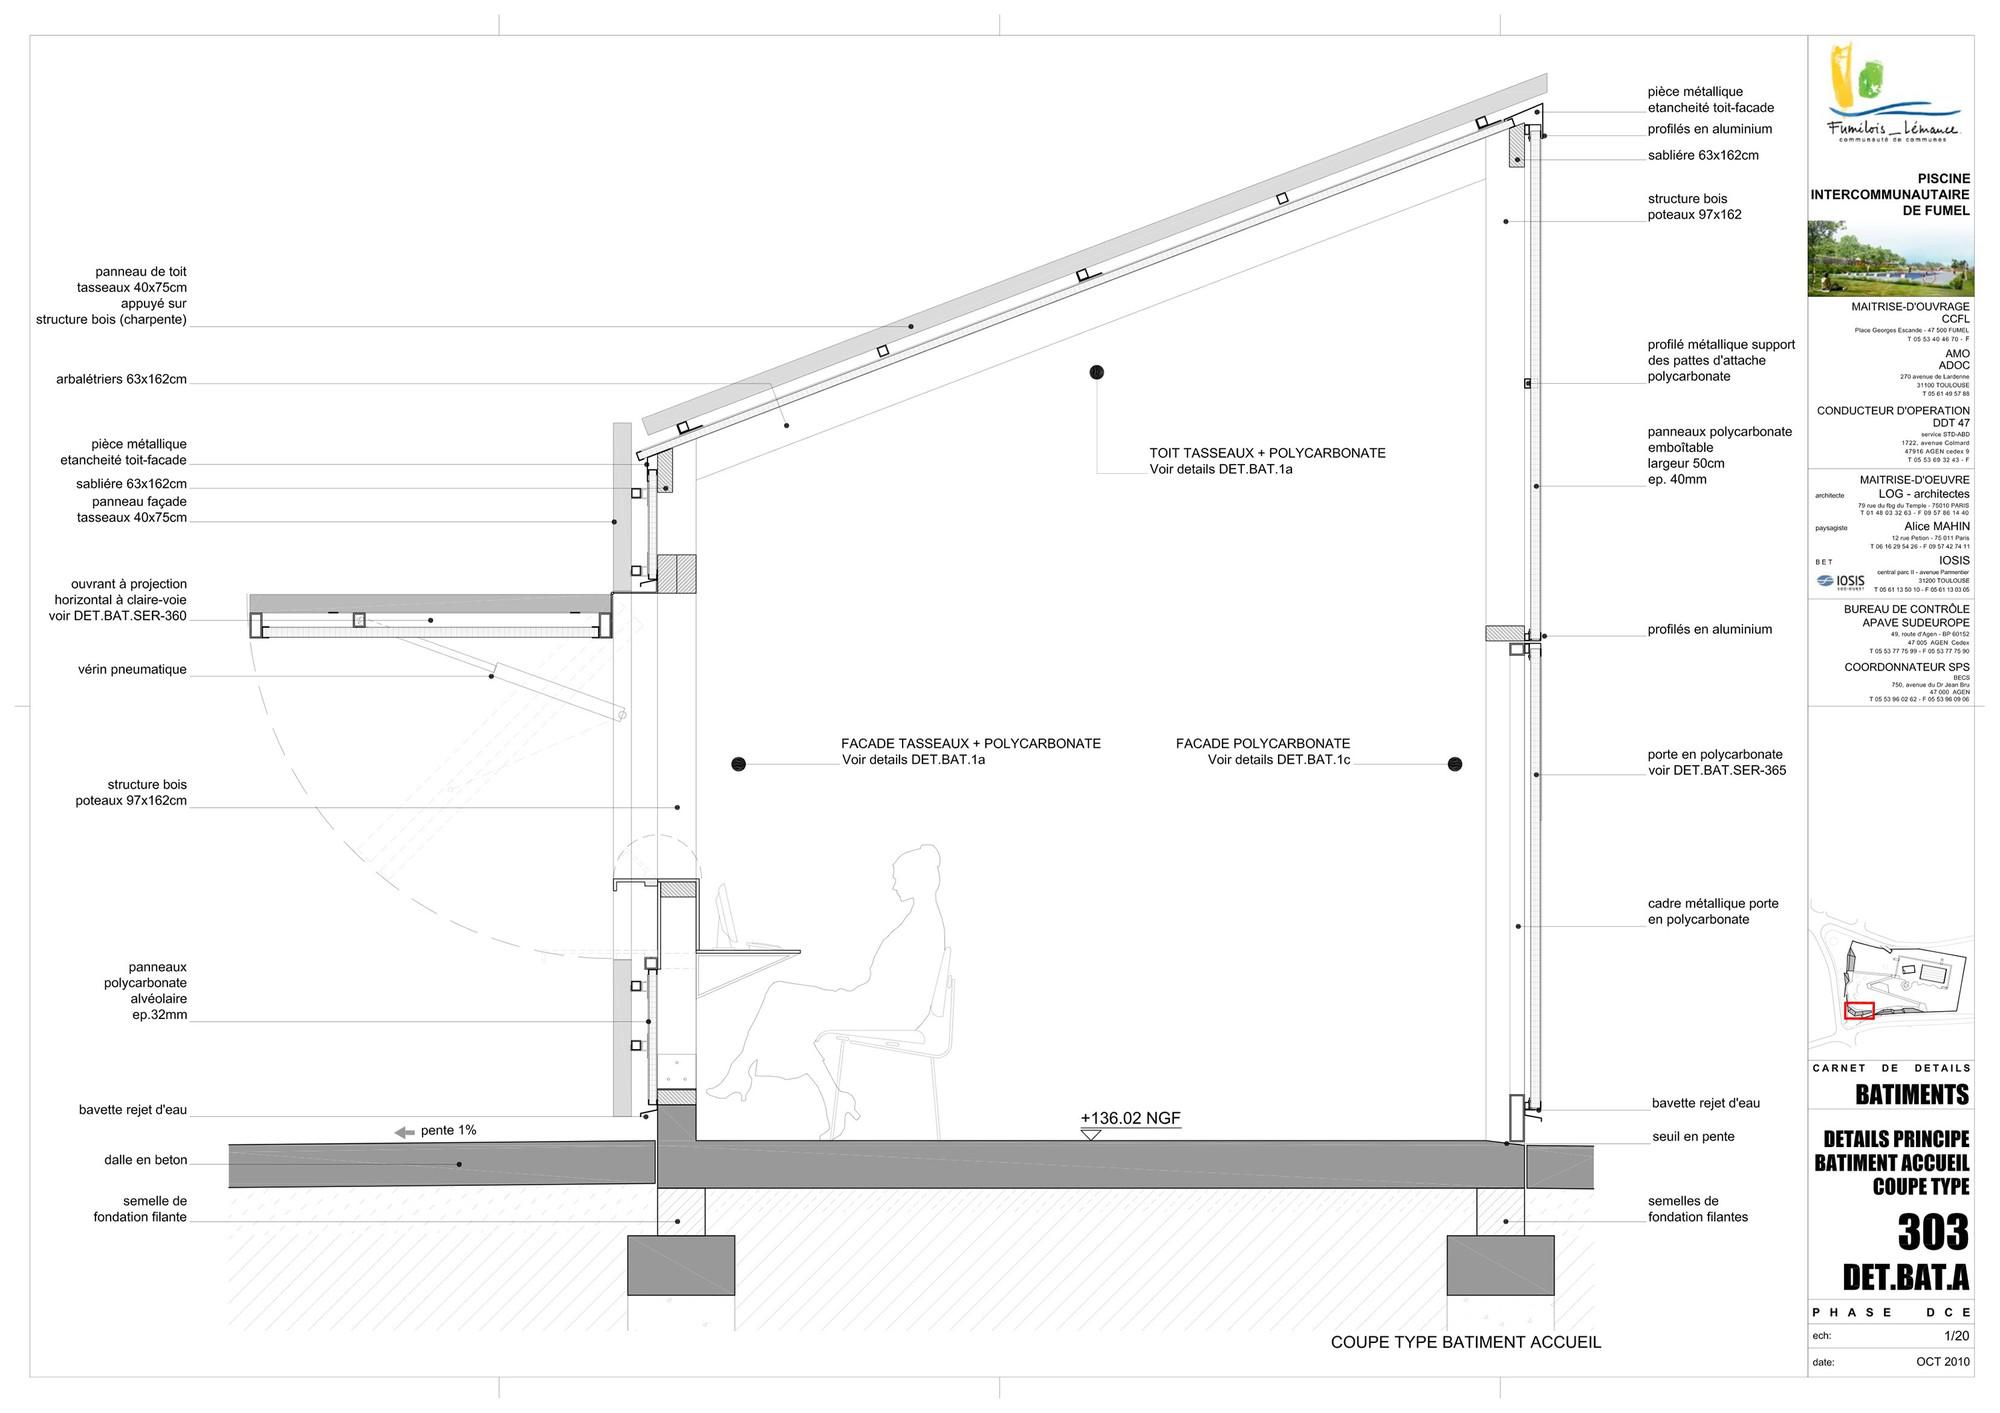 gallery of th tre d 39 eau swimming pool log architectes 31. Black Bedroom Furniture Sets. Home Design Ideas